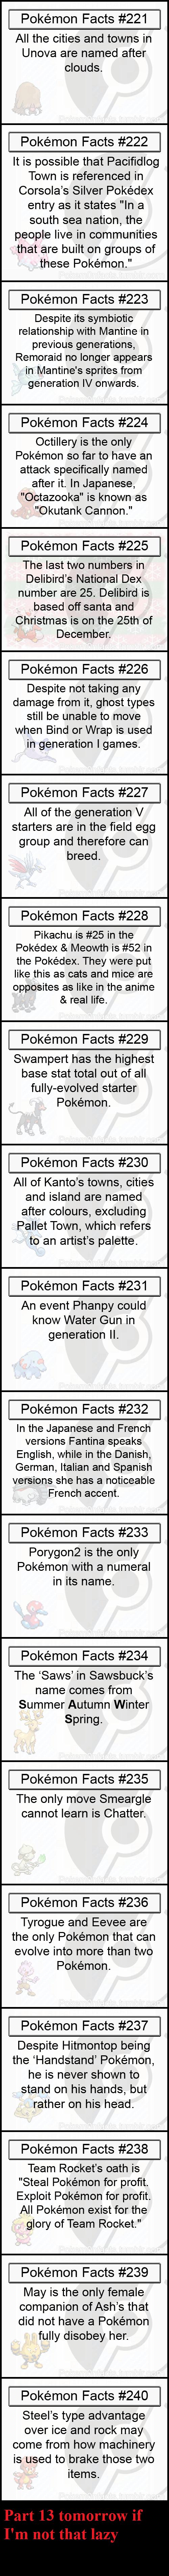 Pokemon Facts 12. Part 11: www.funnyjunk.com/channel/pokemon/Pokemon+Facts+11/xprmGkc/ Part 10: funnyjunk.com/channel/pokemon/Pokemon+Facts+10/mnRhGza/ Part 9: